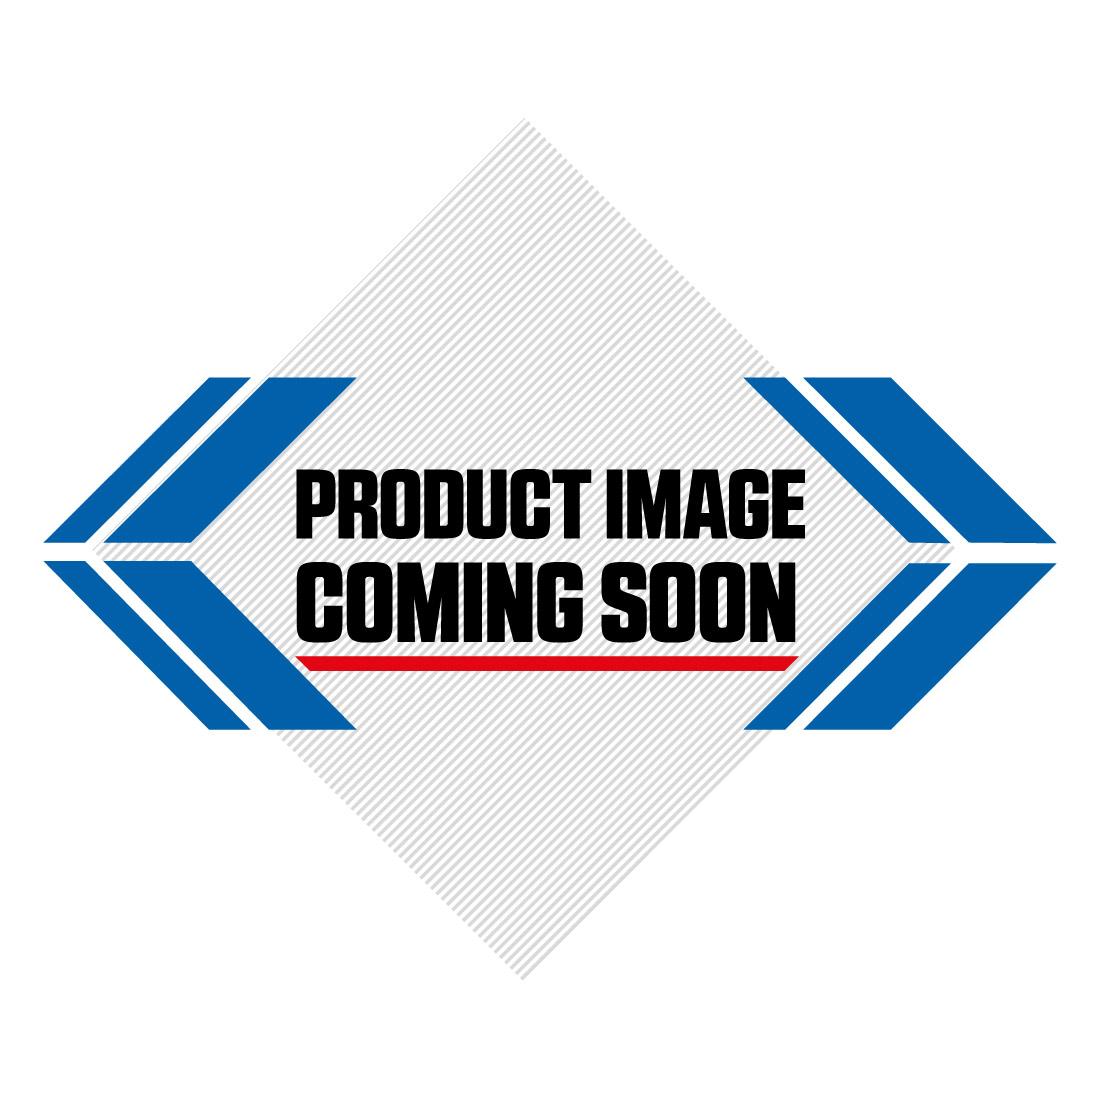 Suzuki Plastic Kit RMZ 450 (11-12) OEM Factory Image-5